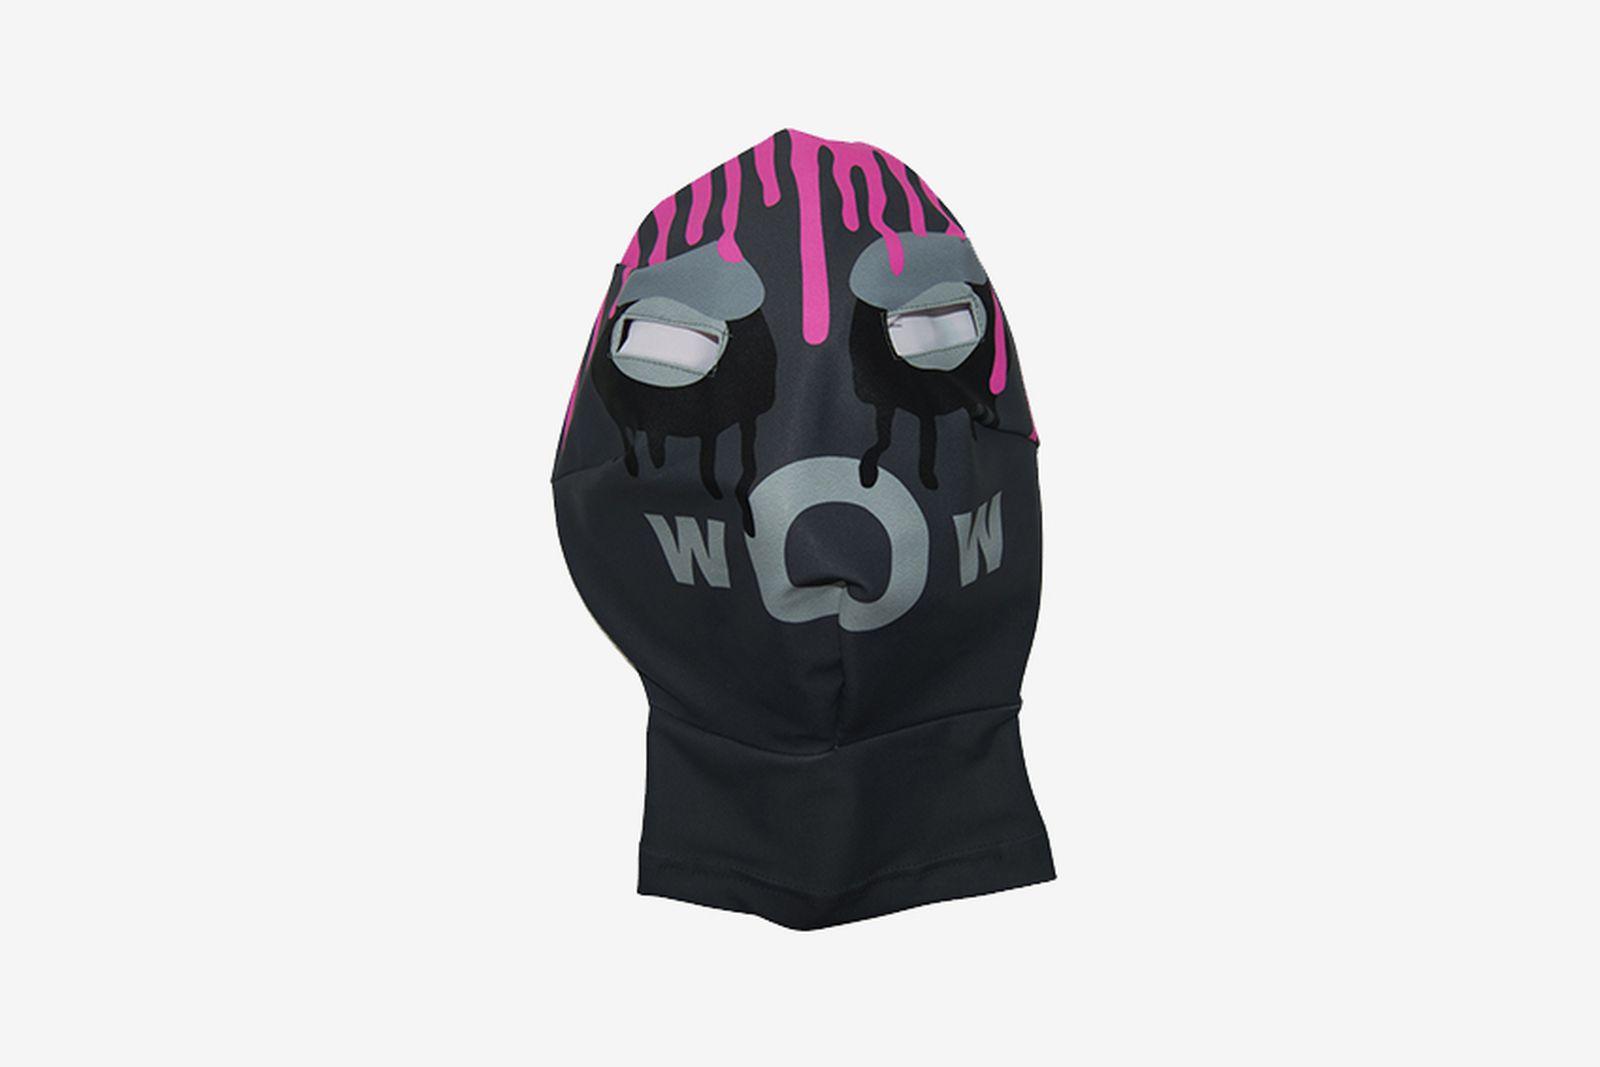 bernahrd willhem mask grey pink grey Kiko Kostadinov Loewe Rick Owens